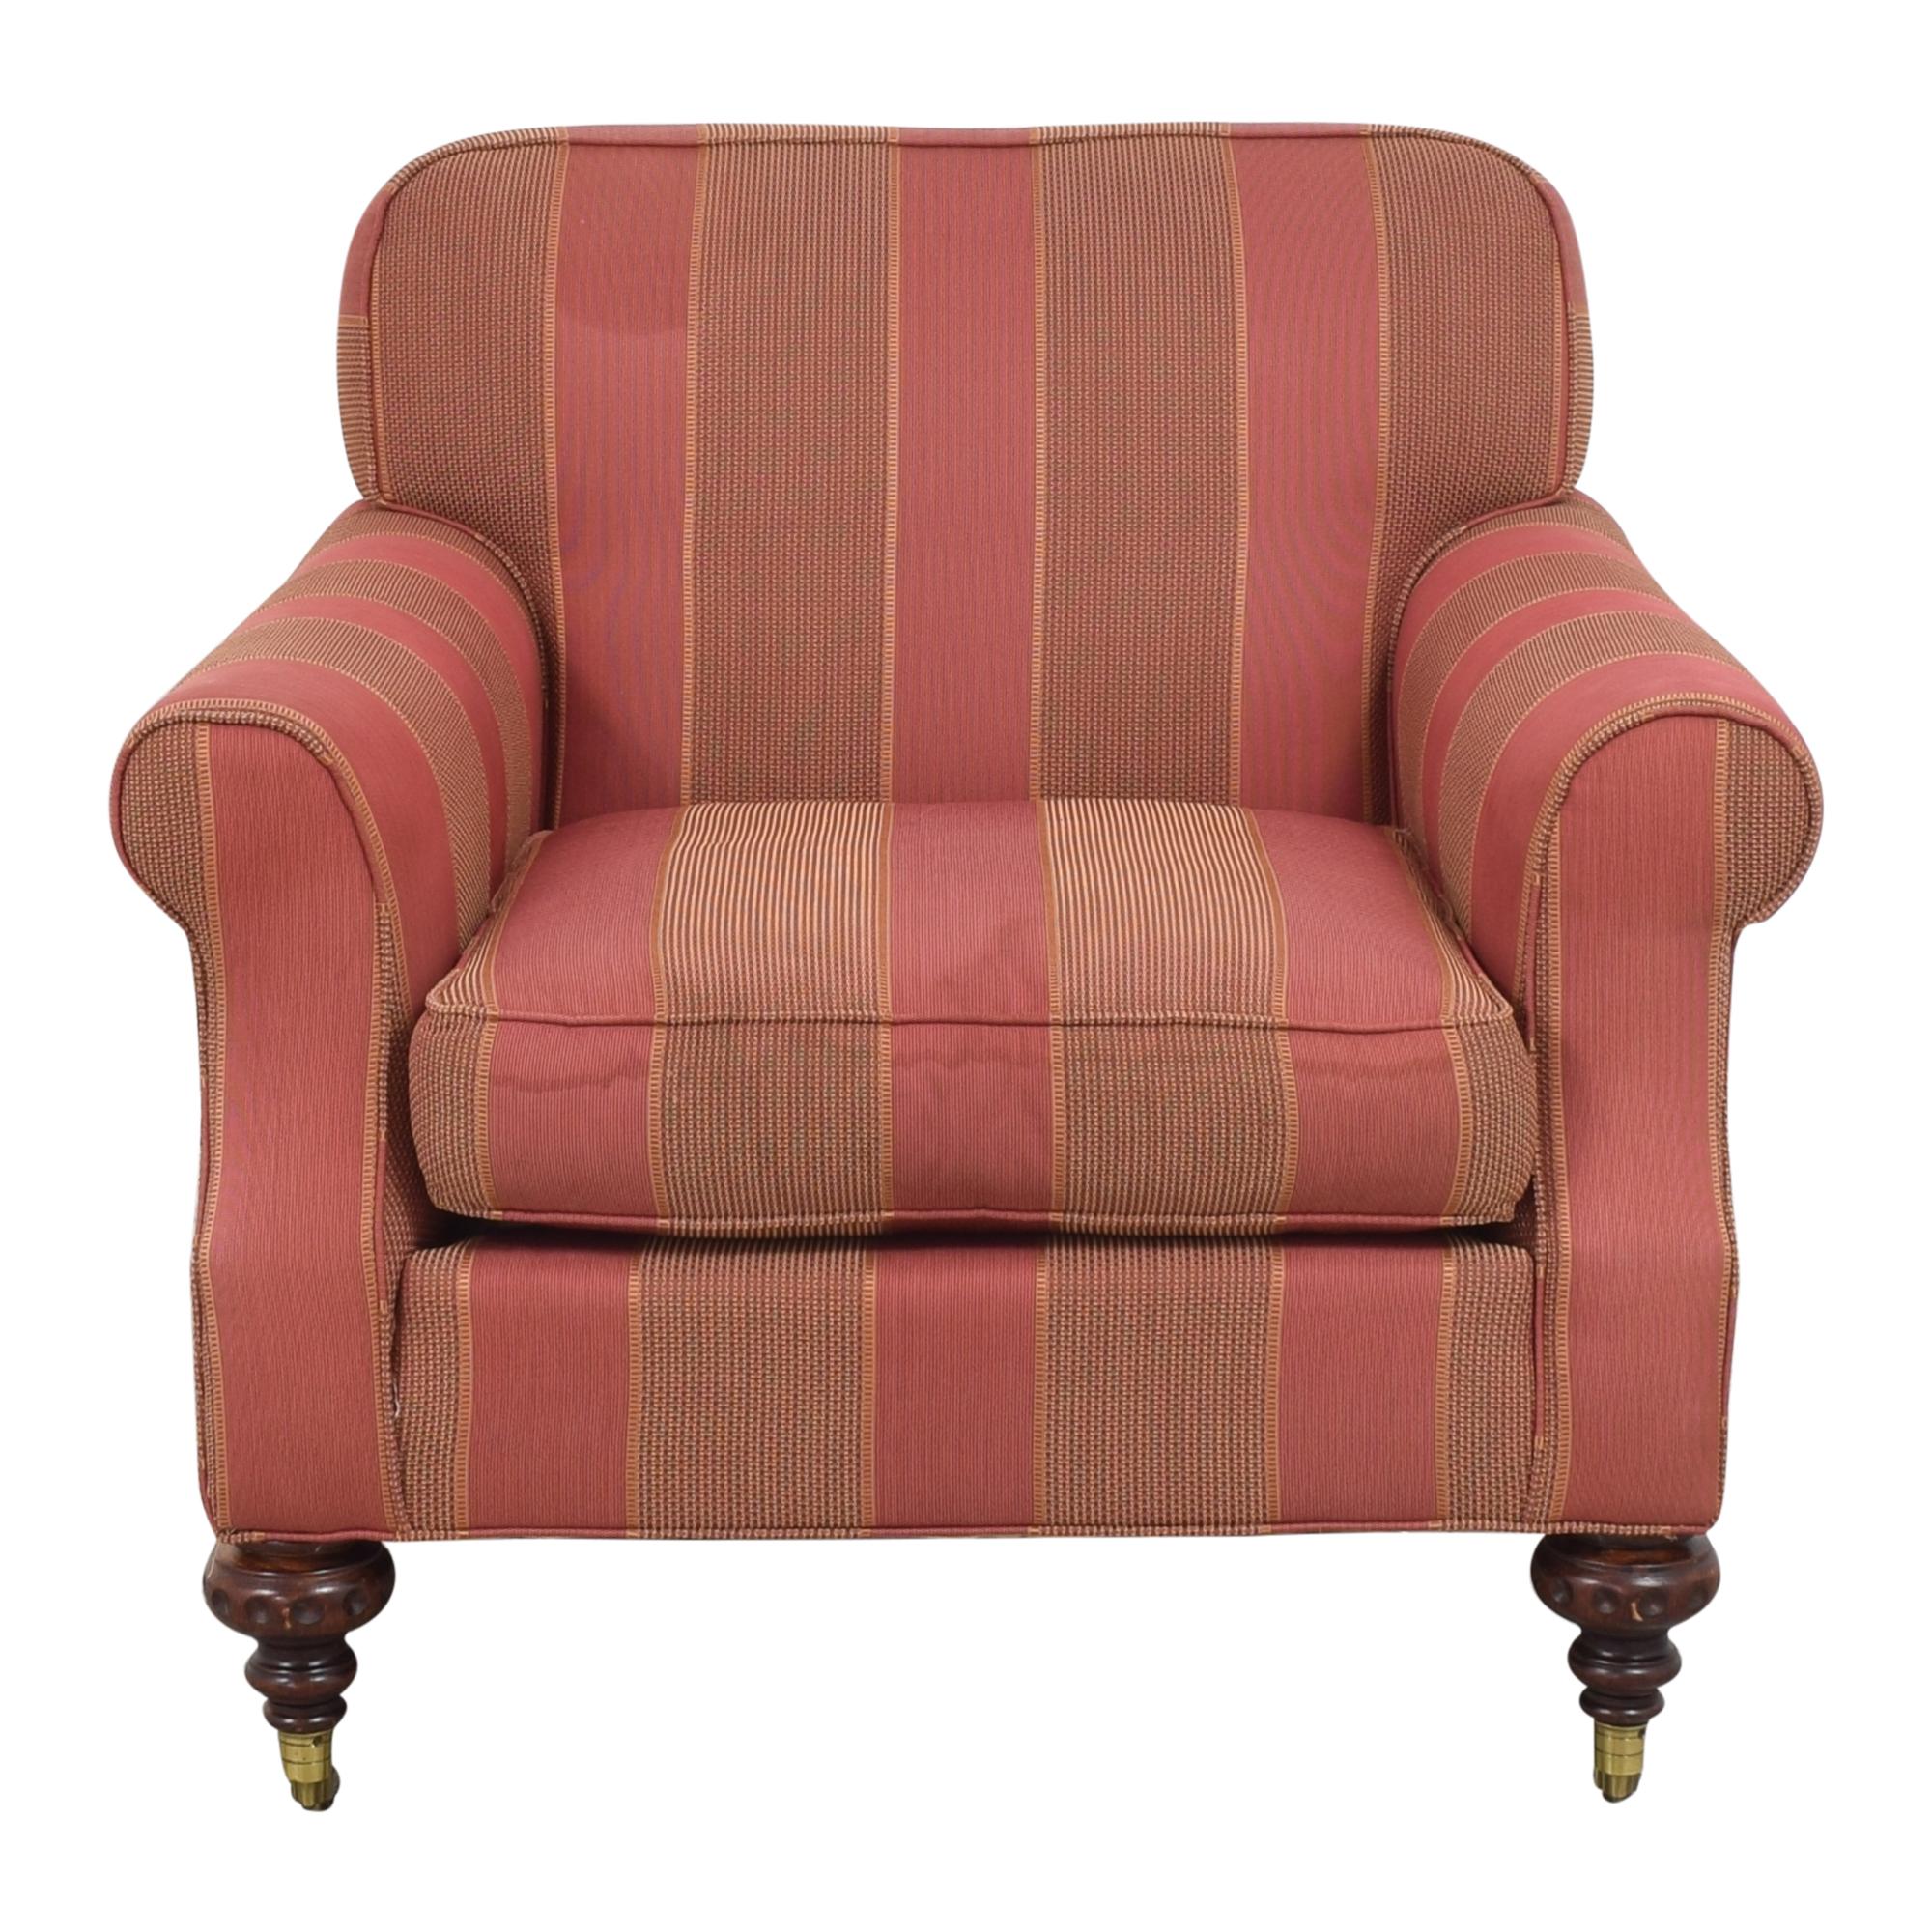 shop Grange Grange Striped Chair with Ottoman online